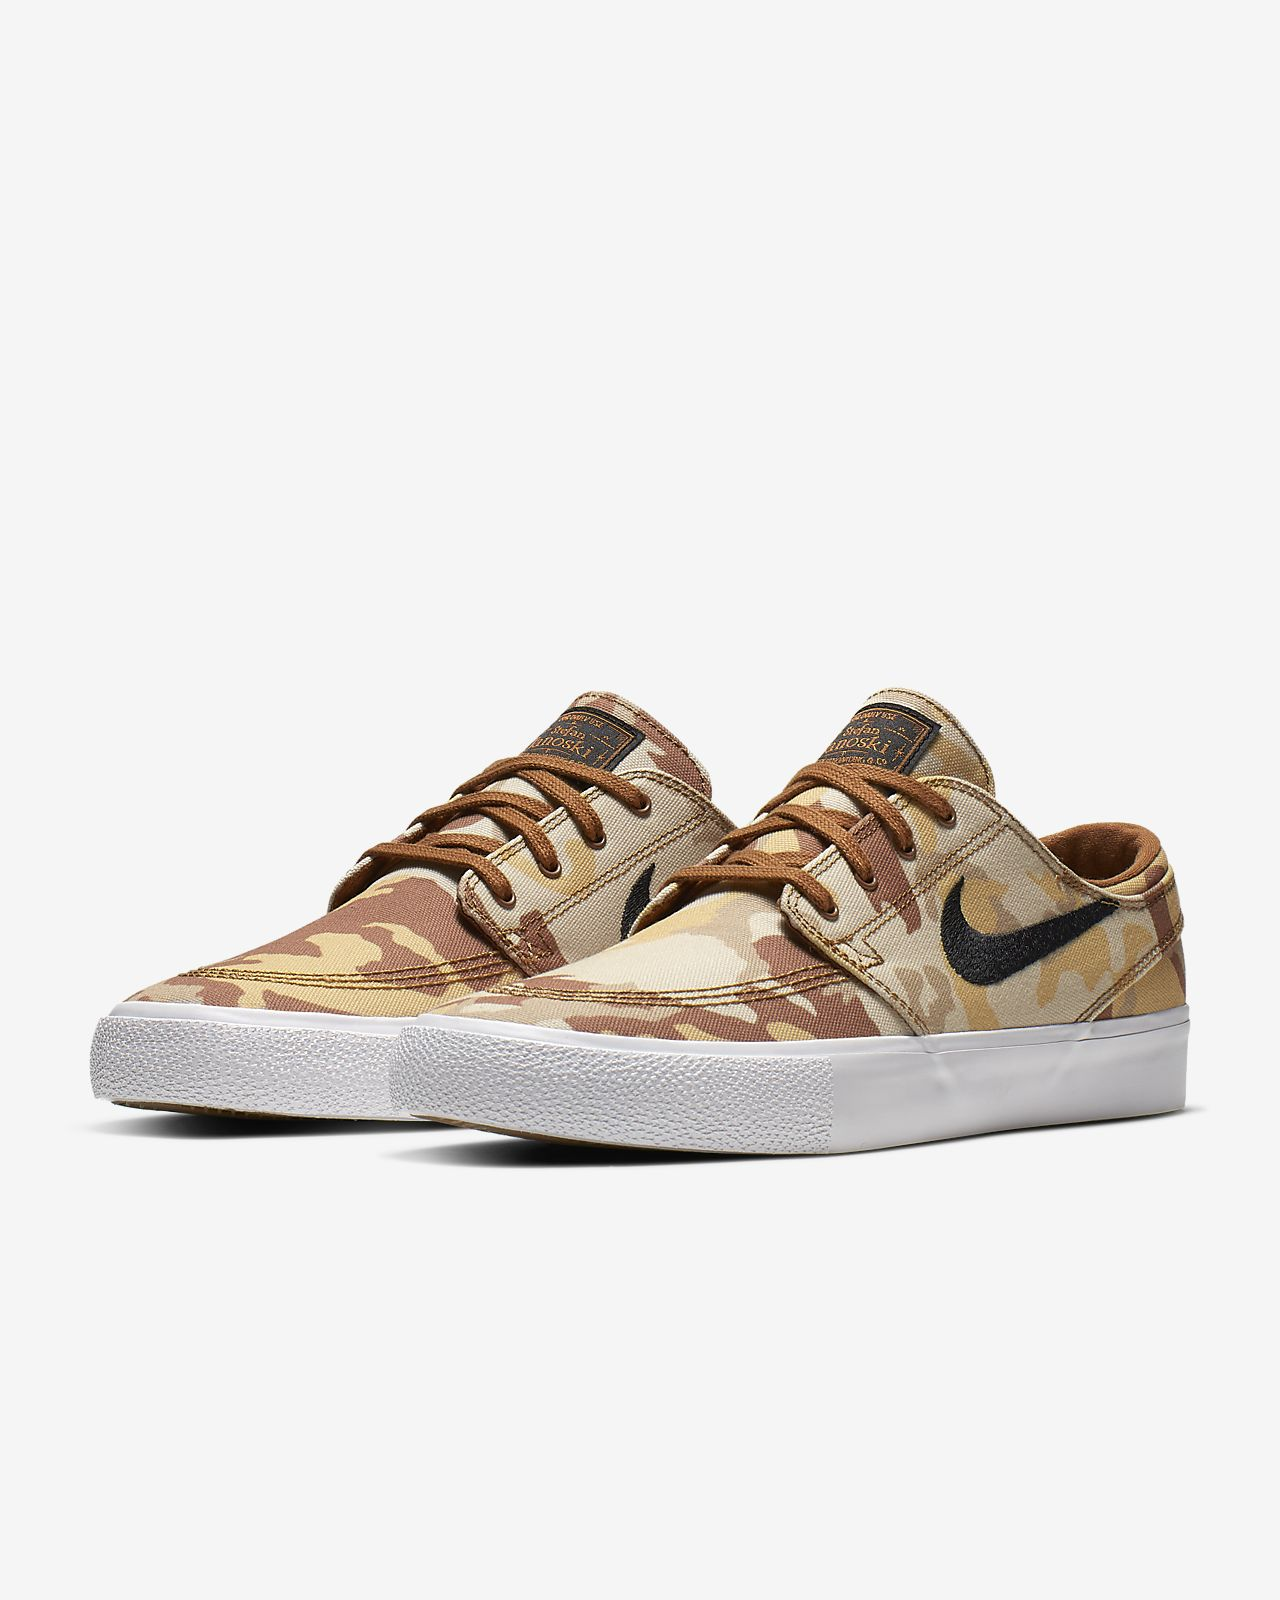 21503b42192ec Nike SB Zoom Stefan Janoski Canvas RM Premium Skate Shoe